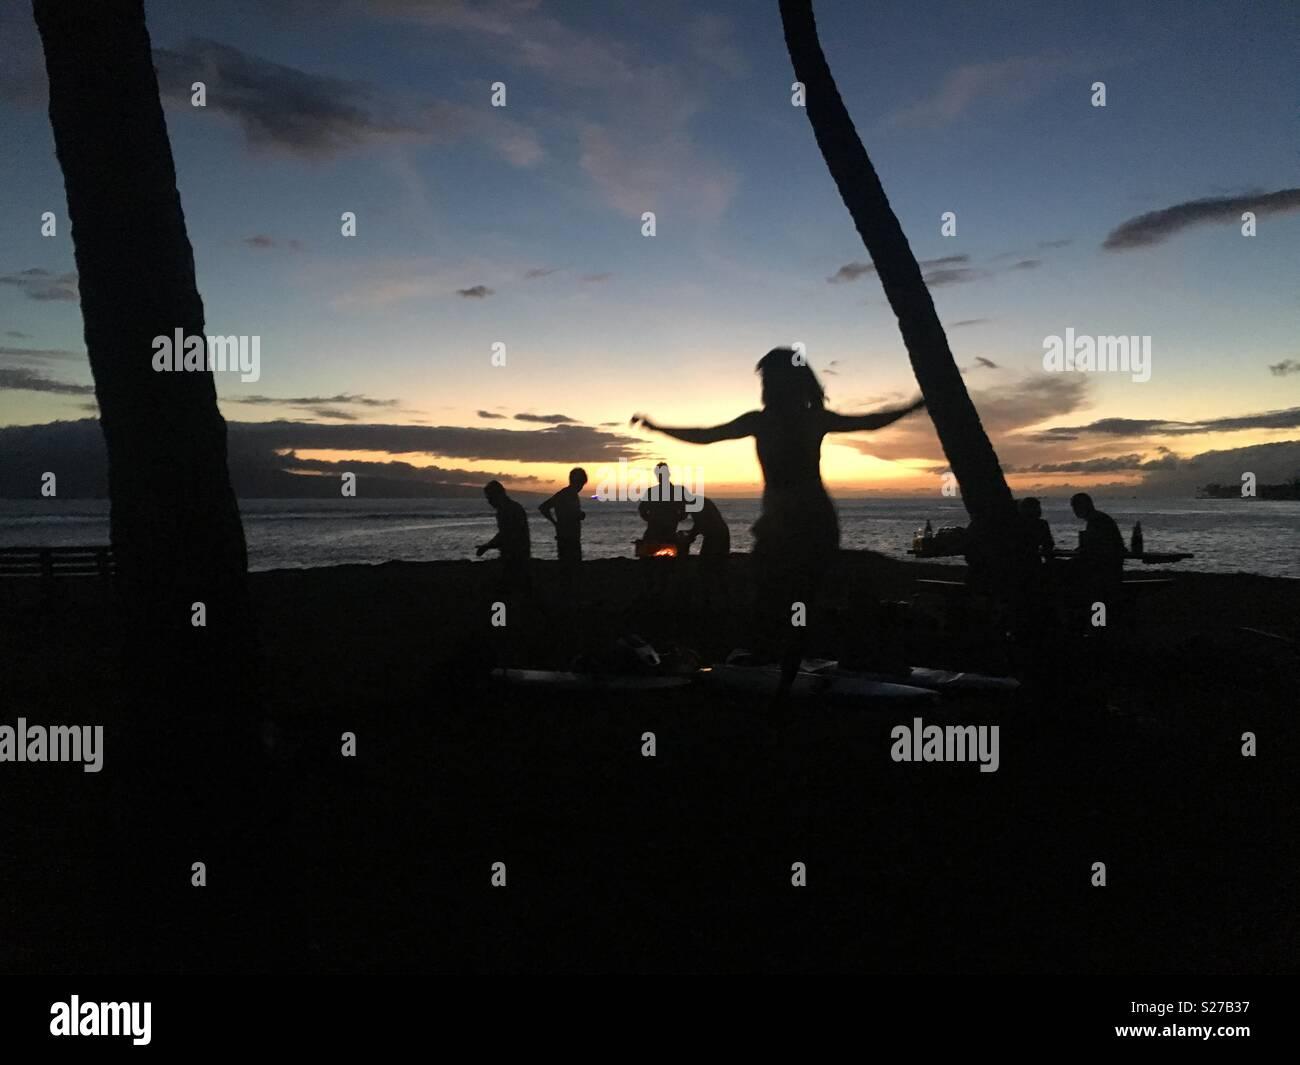 Friends, Sunset, slack line balancing, fire, fish tacos for dinner, full moon surf! Summertime in Maui!!! - Stock Image